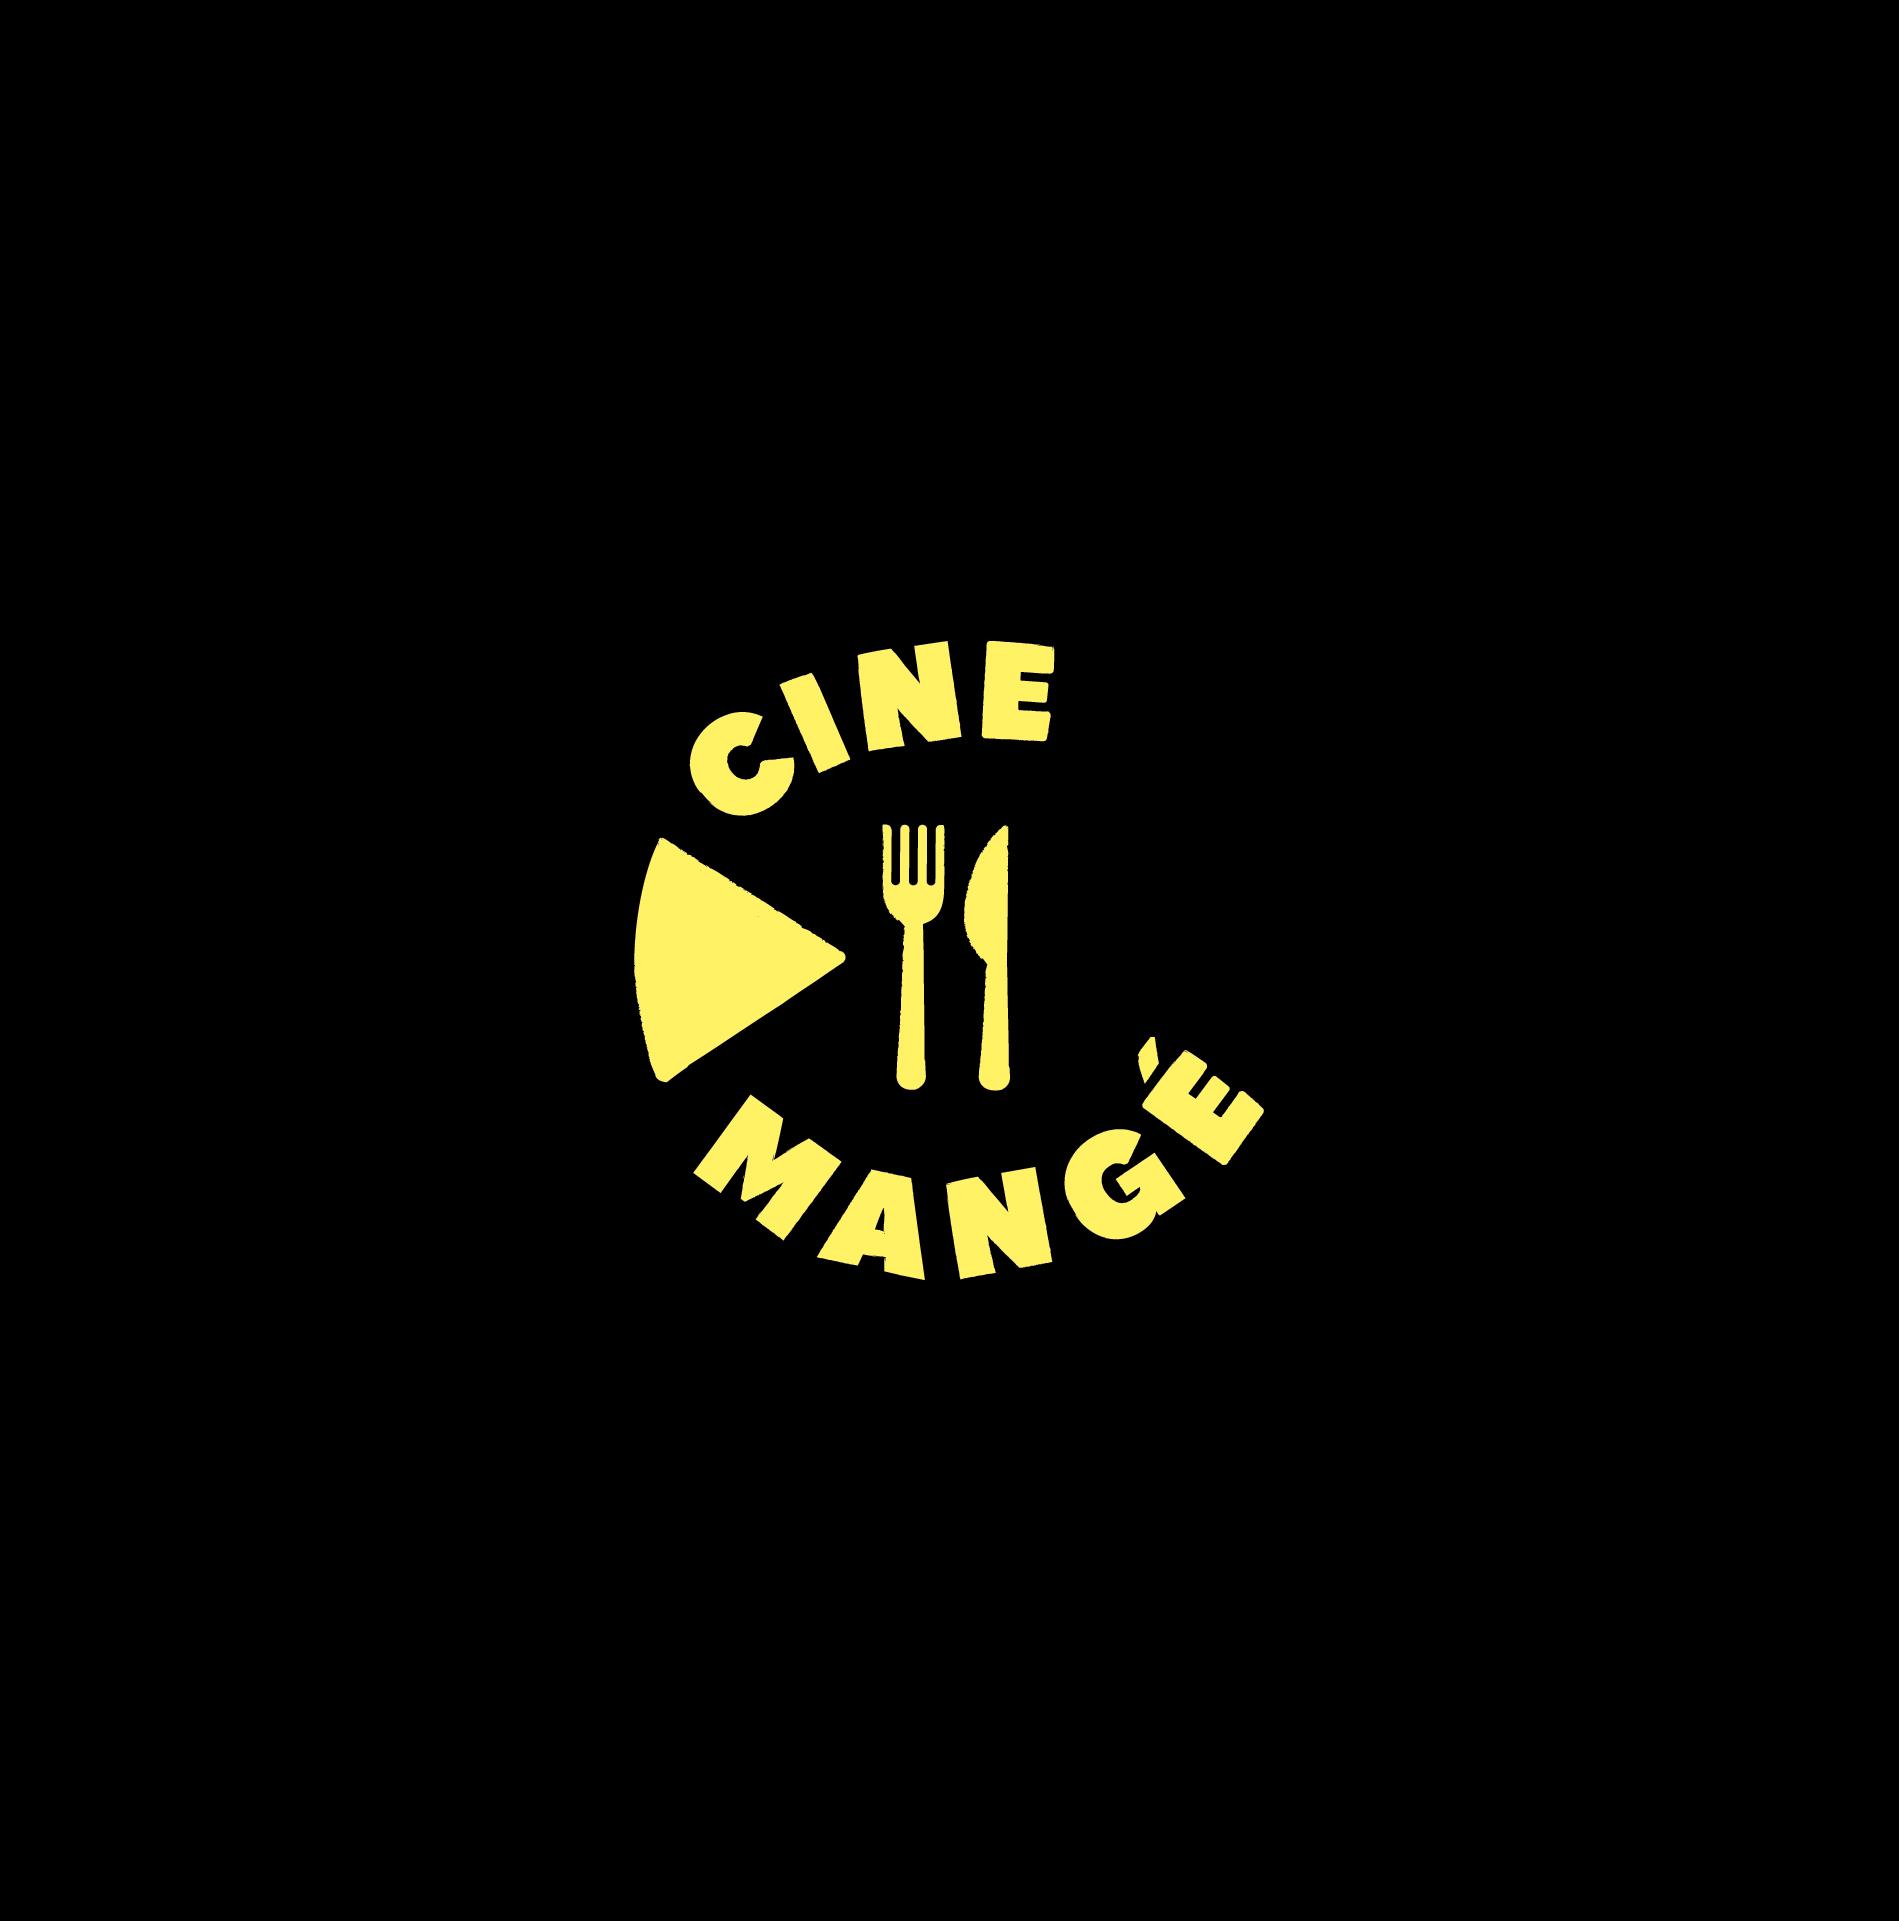 Cinemangé